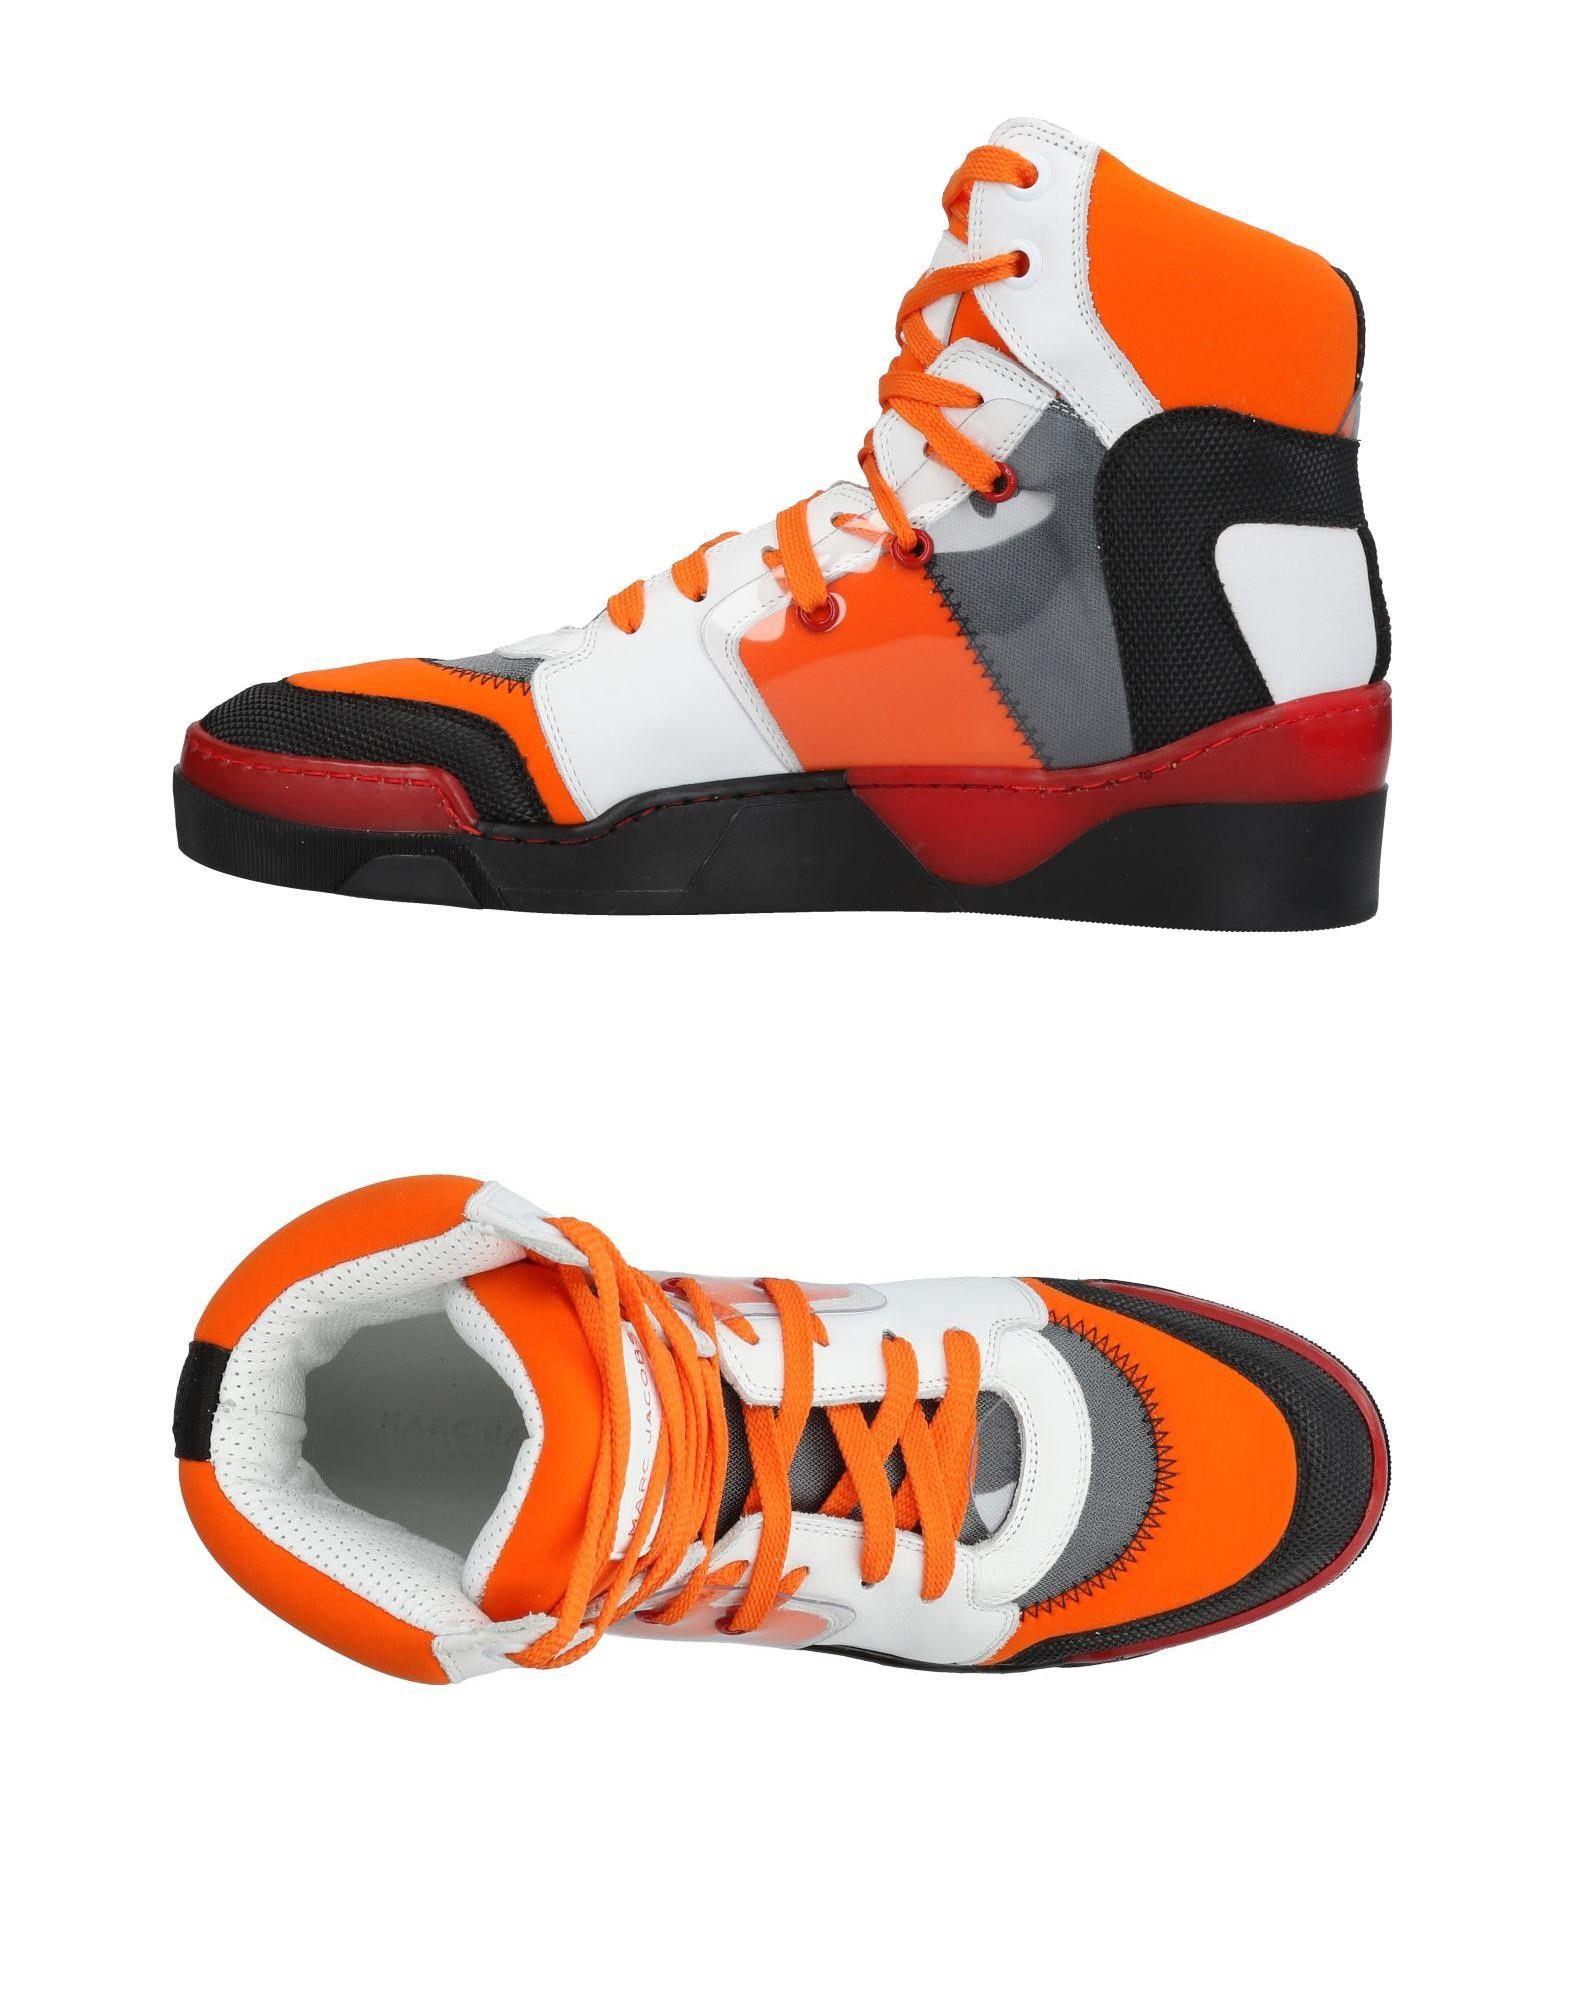 Marc su Jacobs Sneakers Acquista Uomo online wZ7vOvqzg